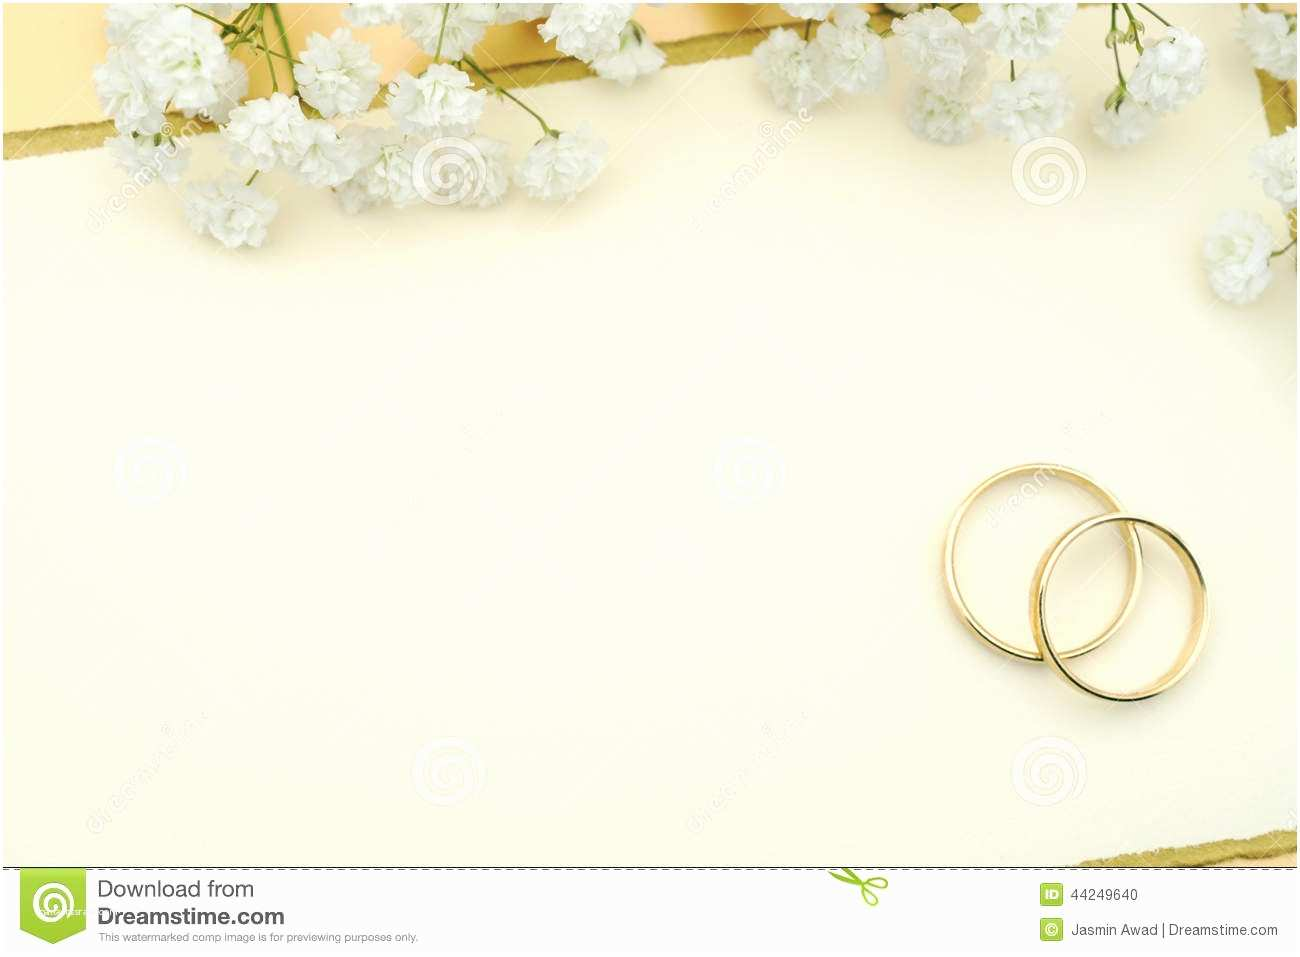 Blank Wedding Invitation Stock Wedding Invitation Stock Image Ring Invi Free